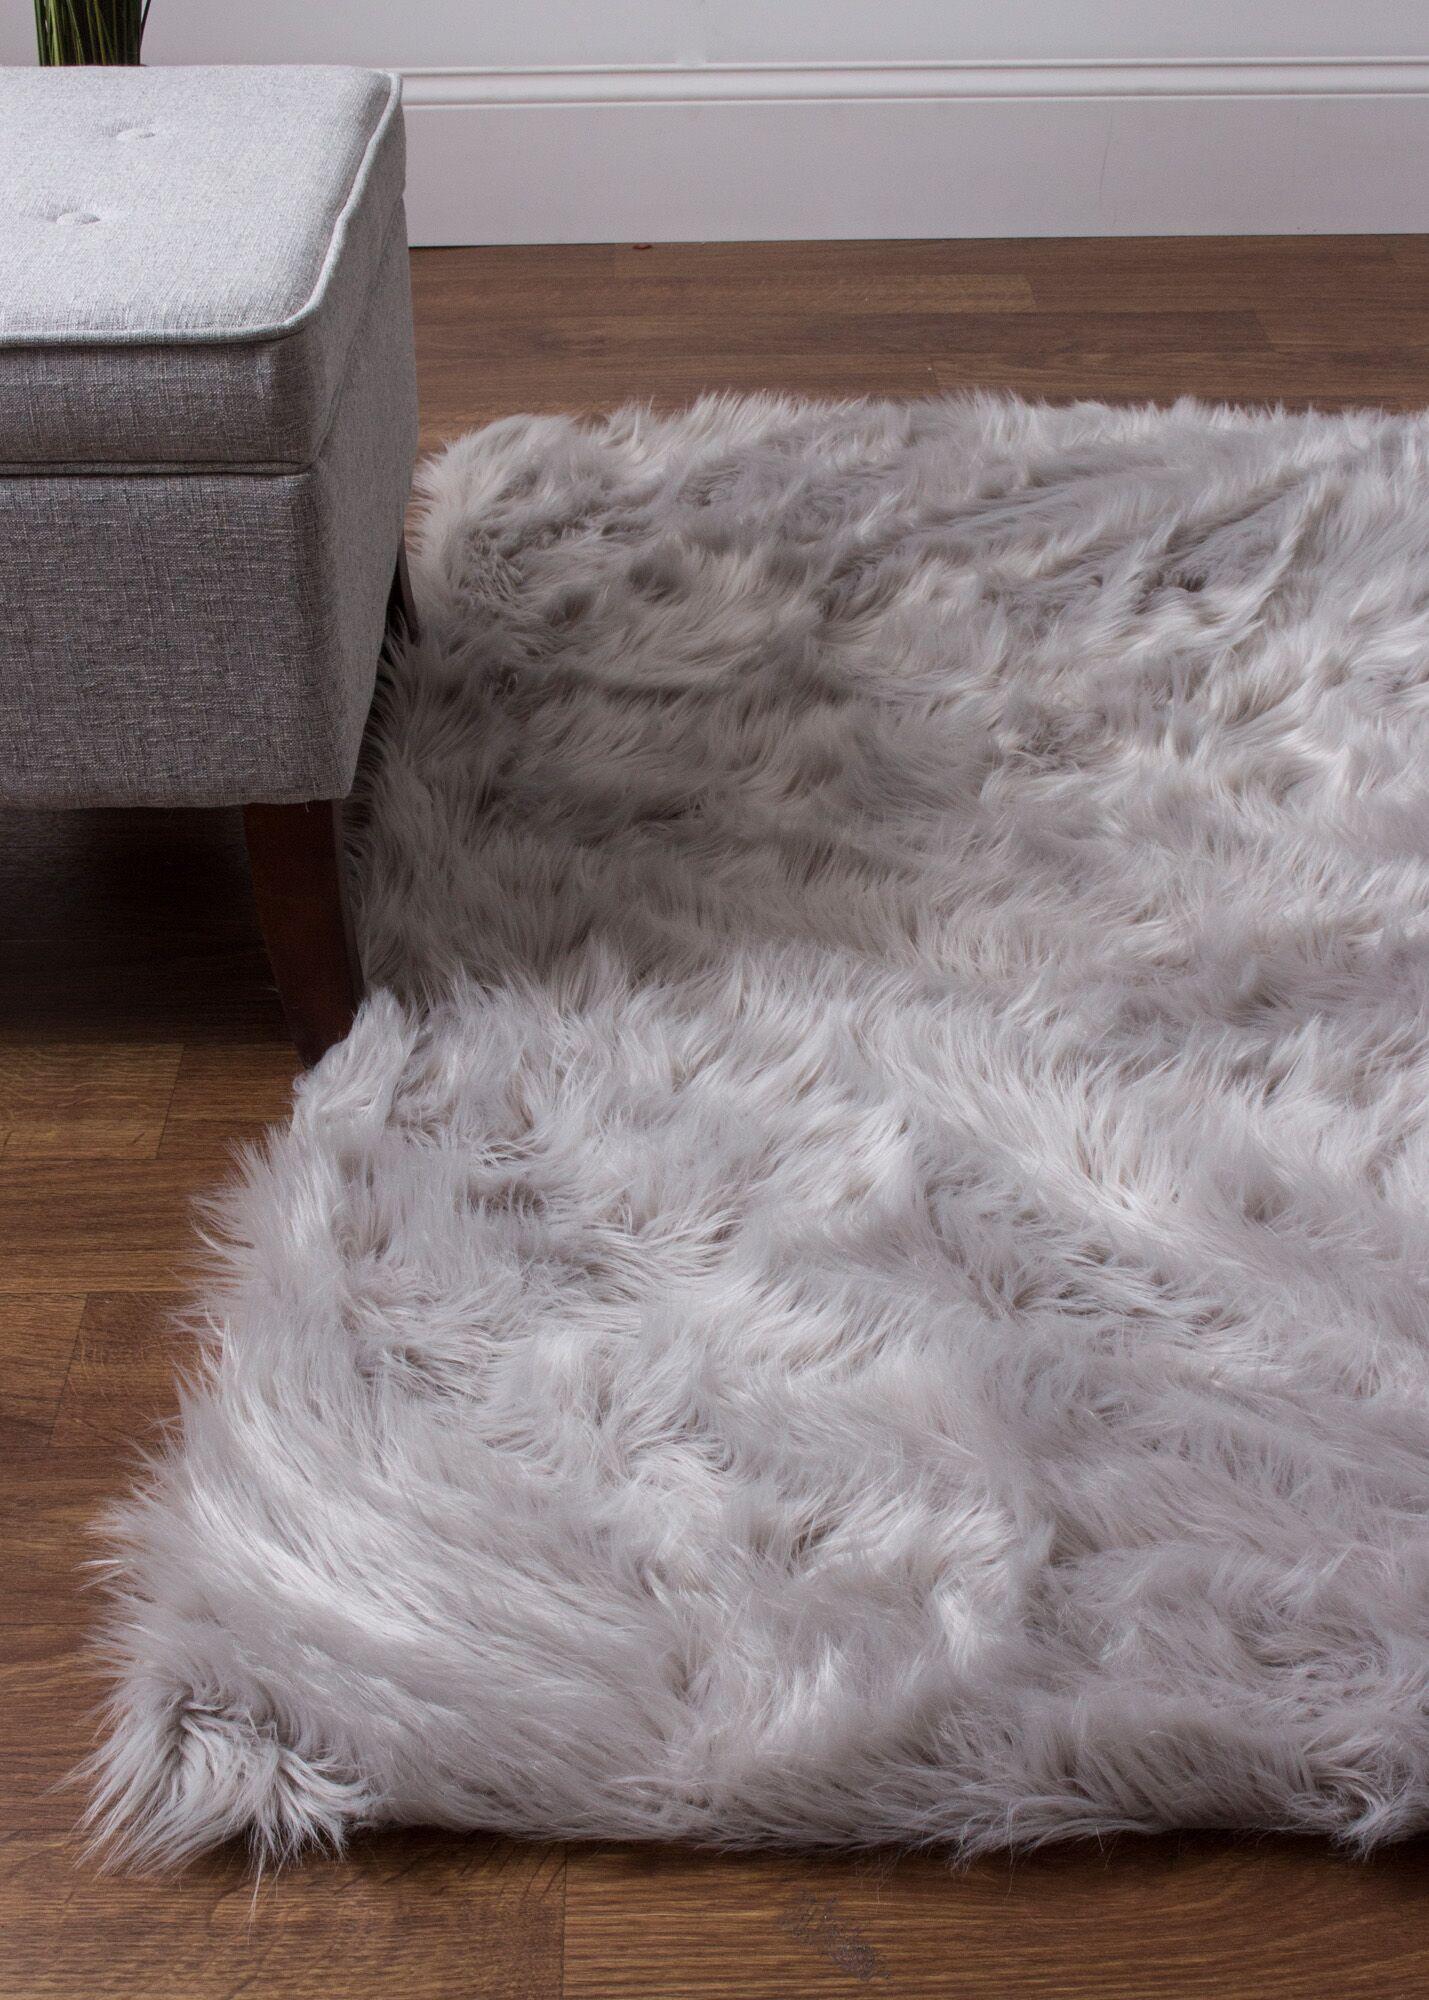 Charlotte Hand-Woven Faux Sheepskin Gray Area Rug Rug Size: 5' x 7'